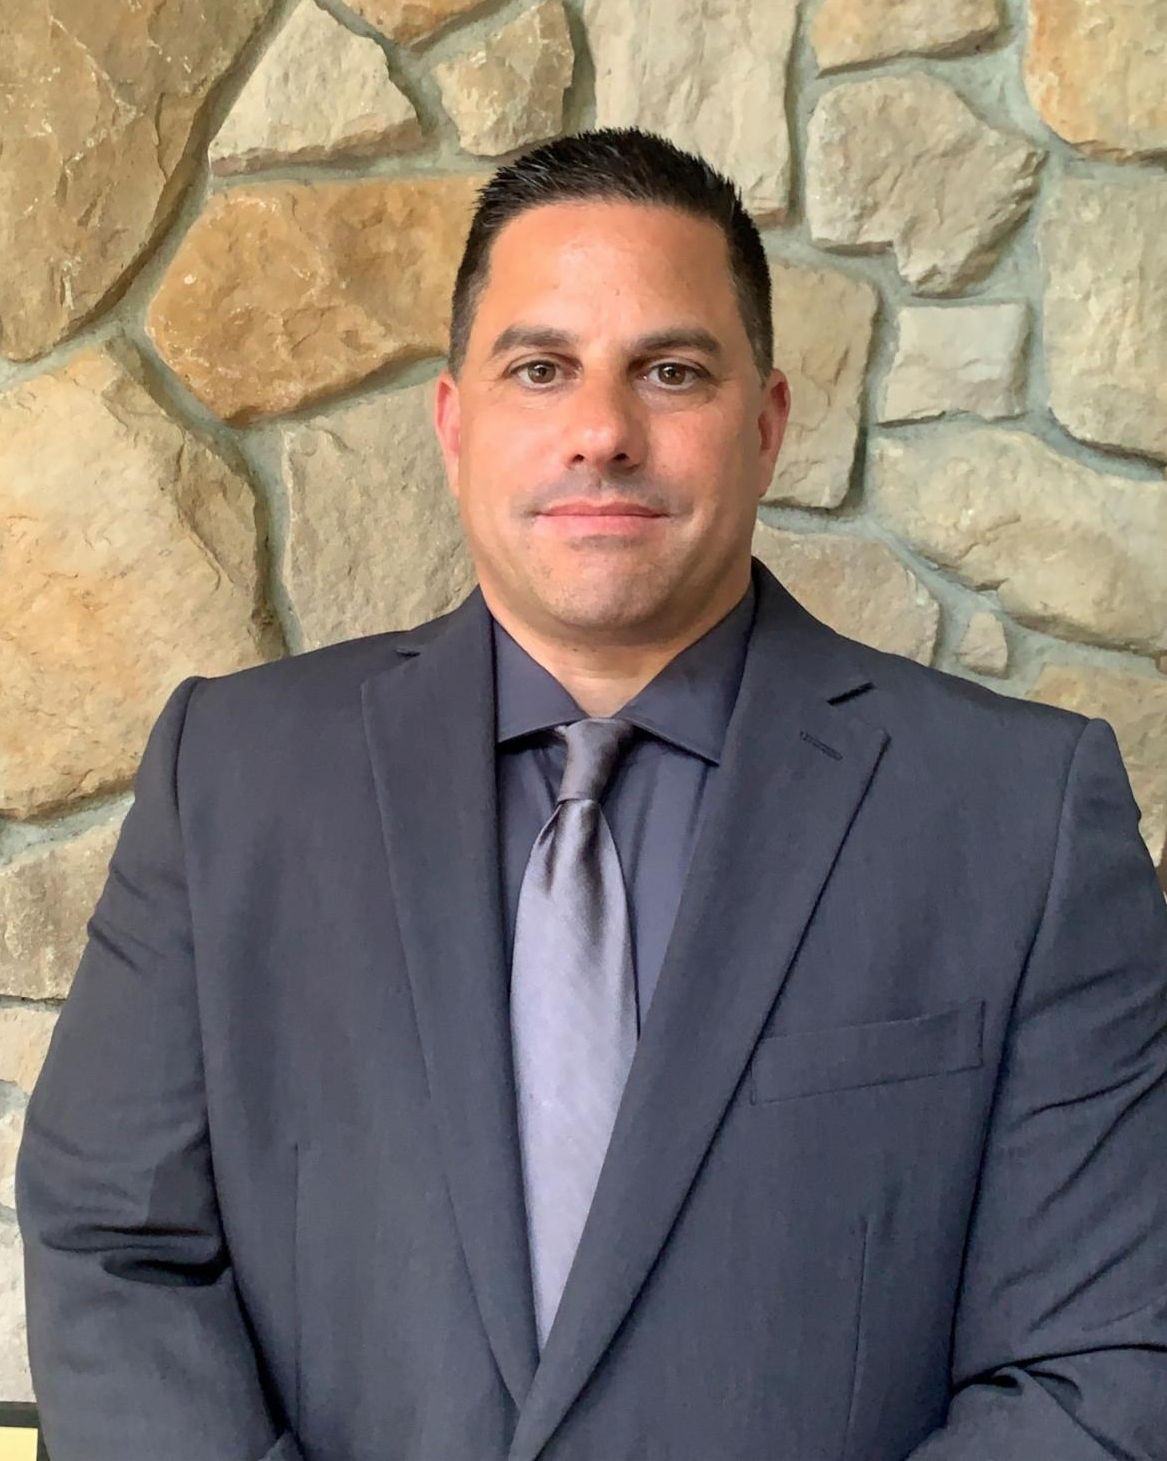 Image: headshot of Communal Security Director John Colangelo